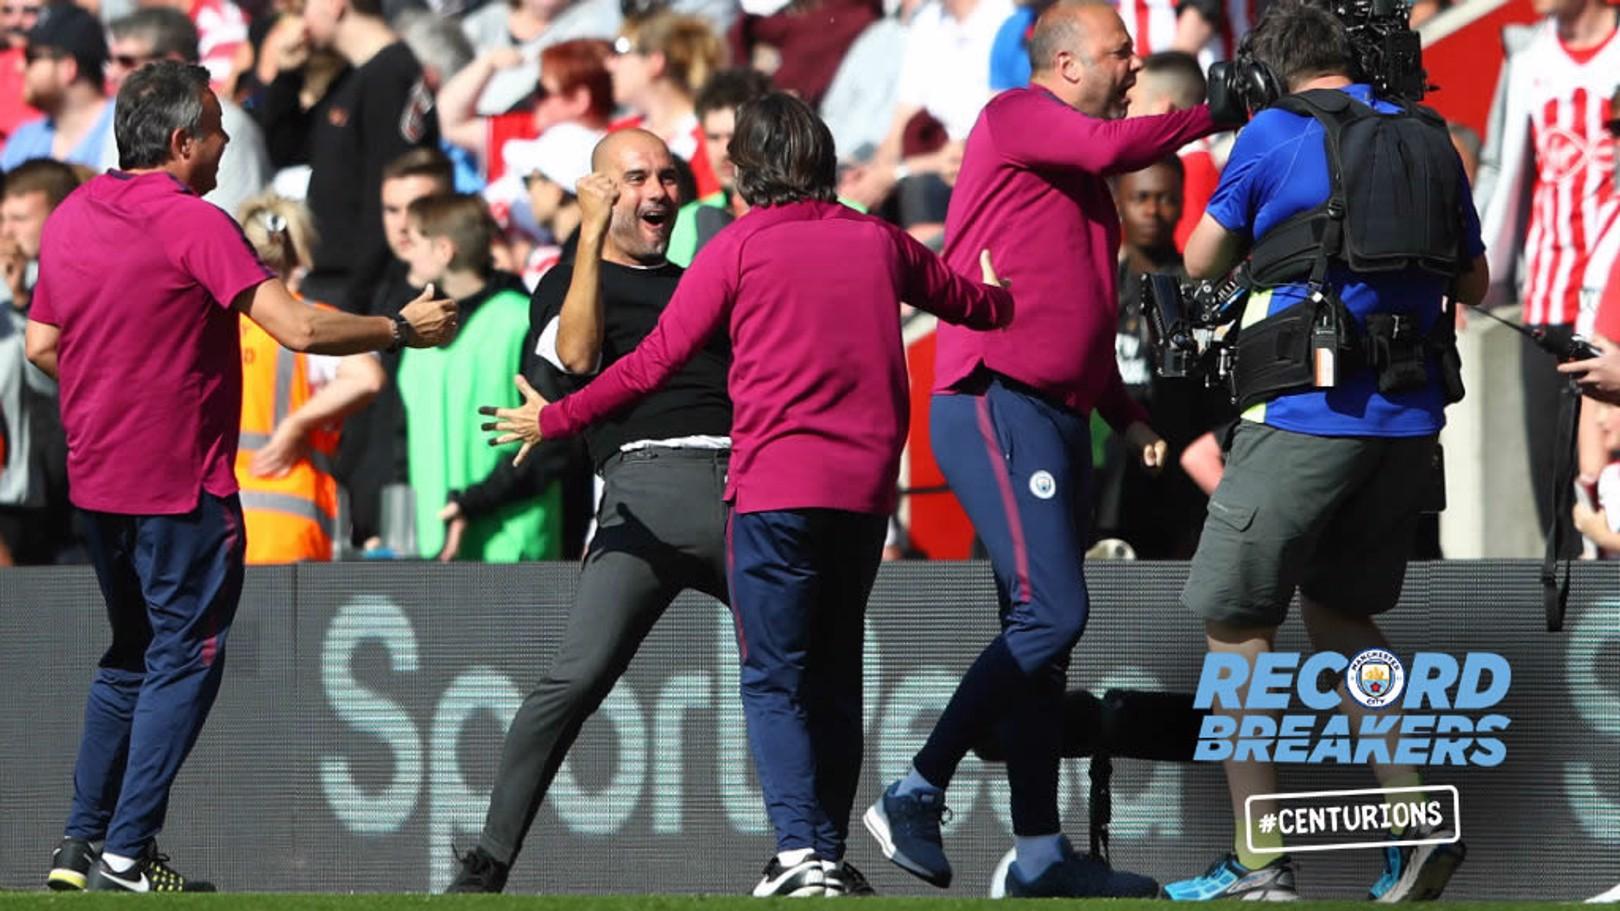 100 UP! Pep Guardiola and team celebrate